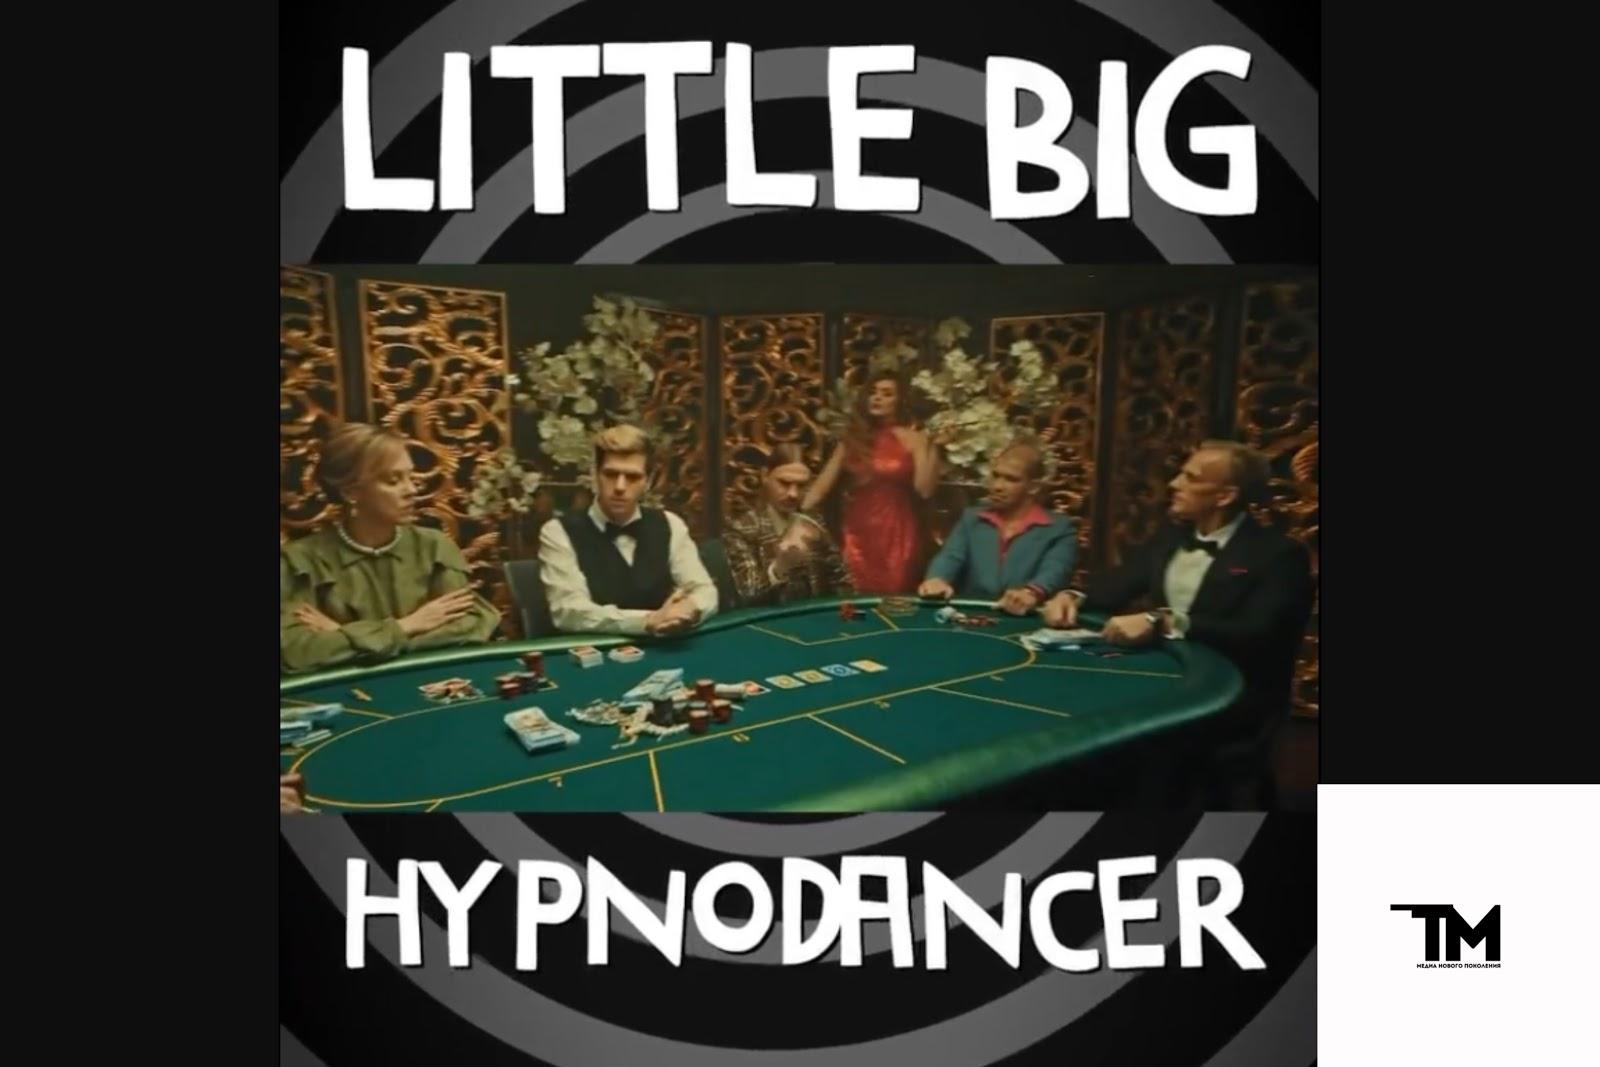 «Hypnodancer»: новый танцевальный бэнгер от Little Big